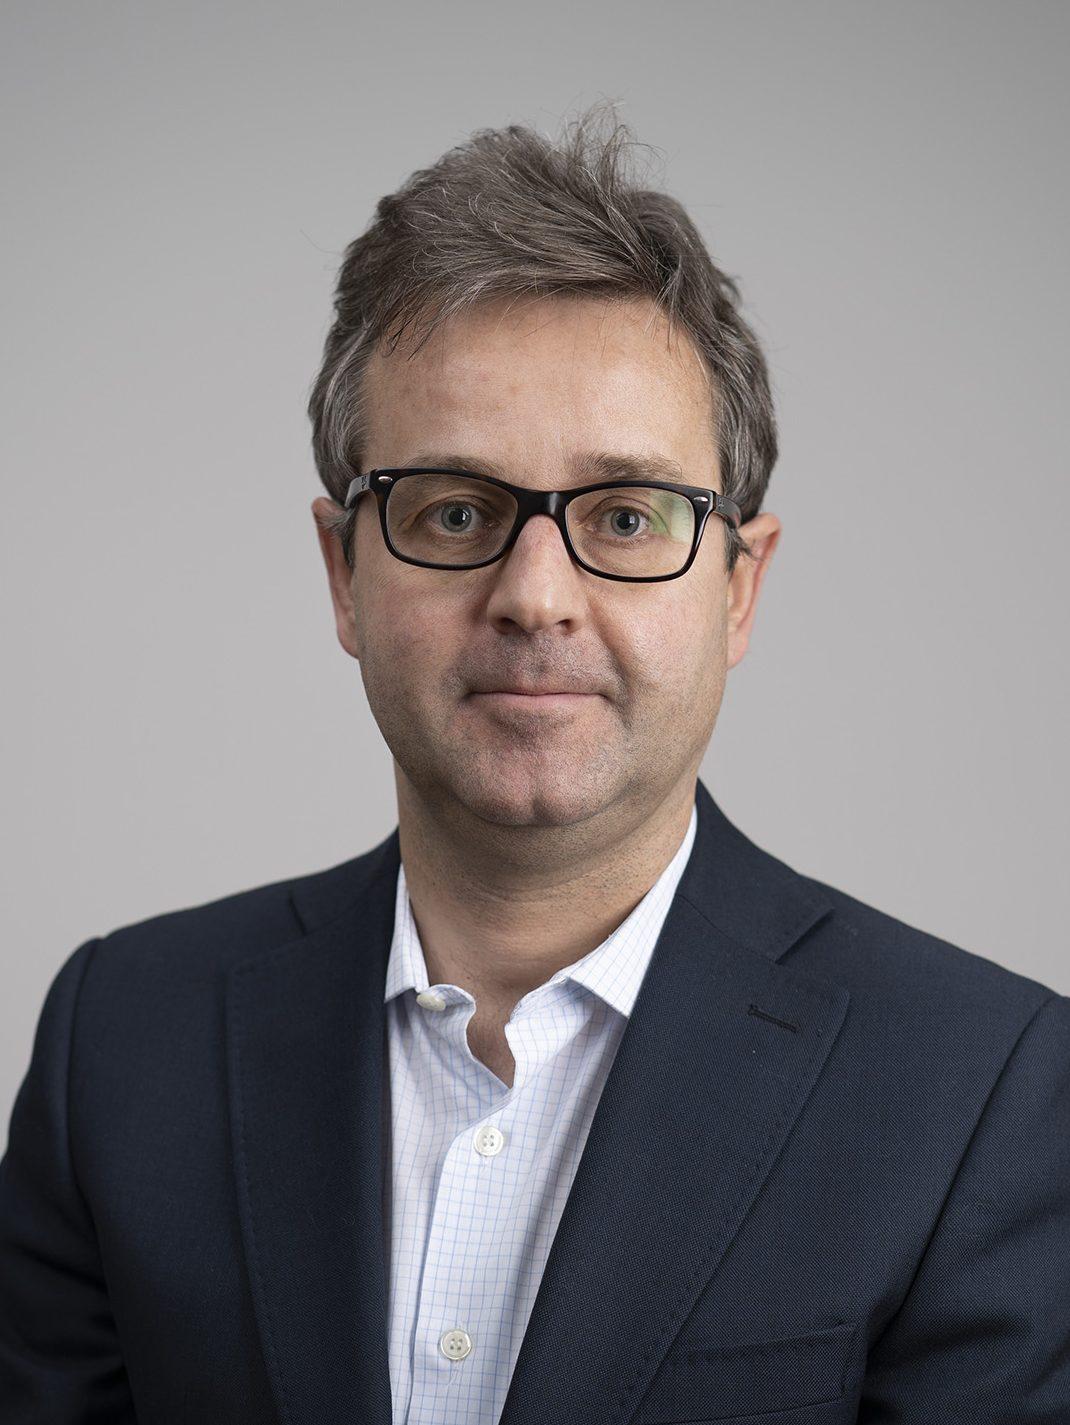 Dr. Alexander Blazquez Lidoy